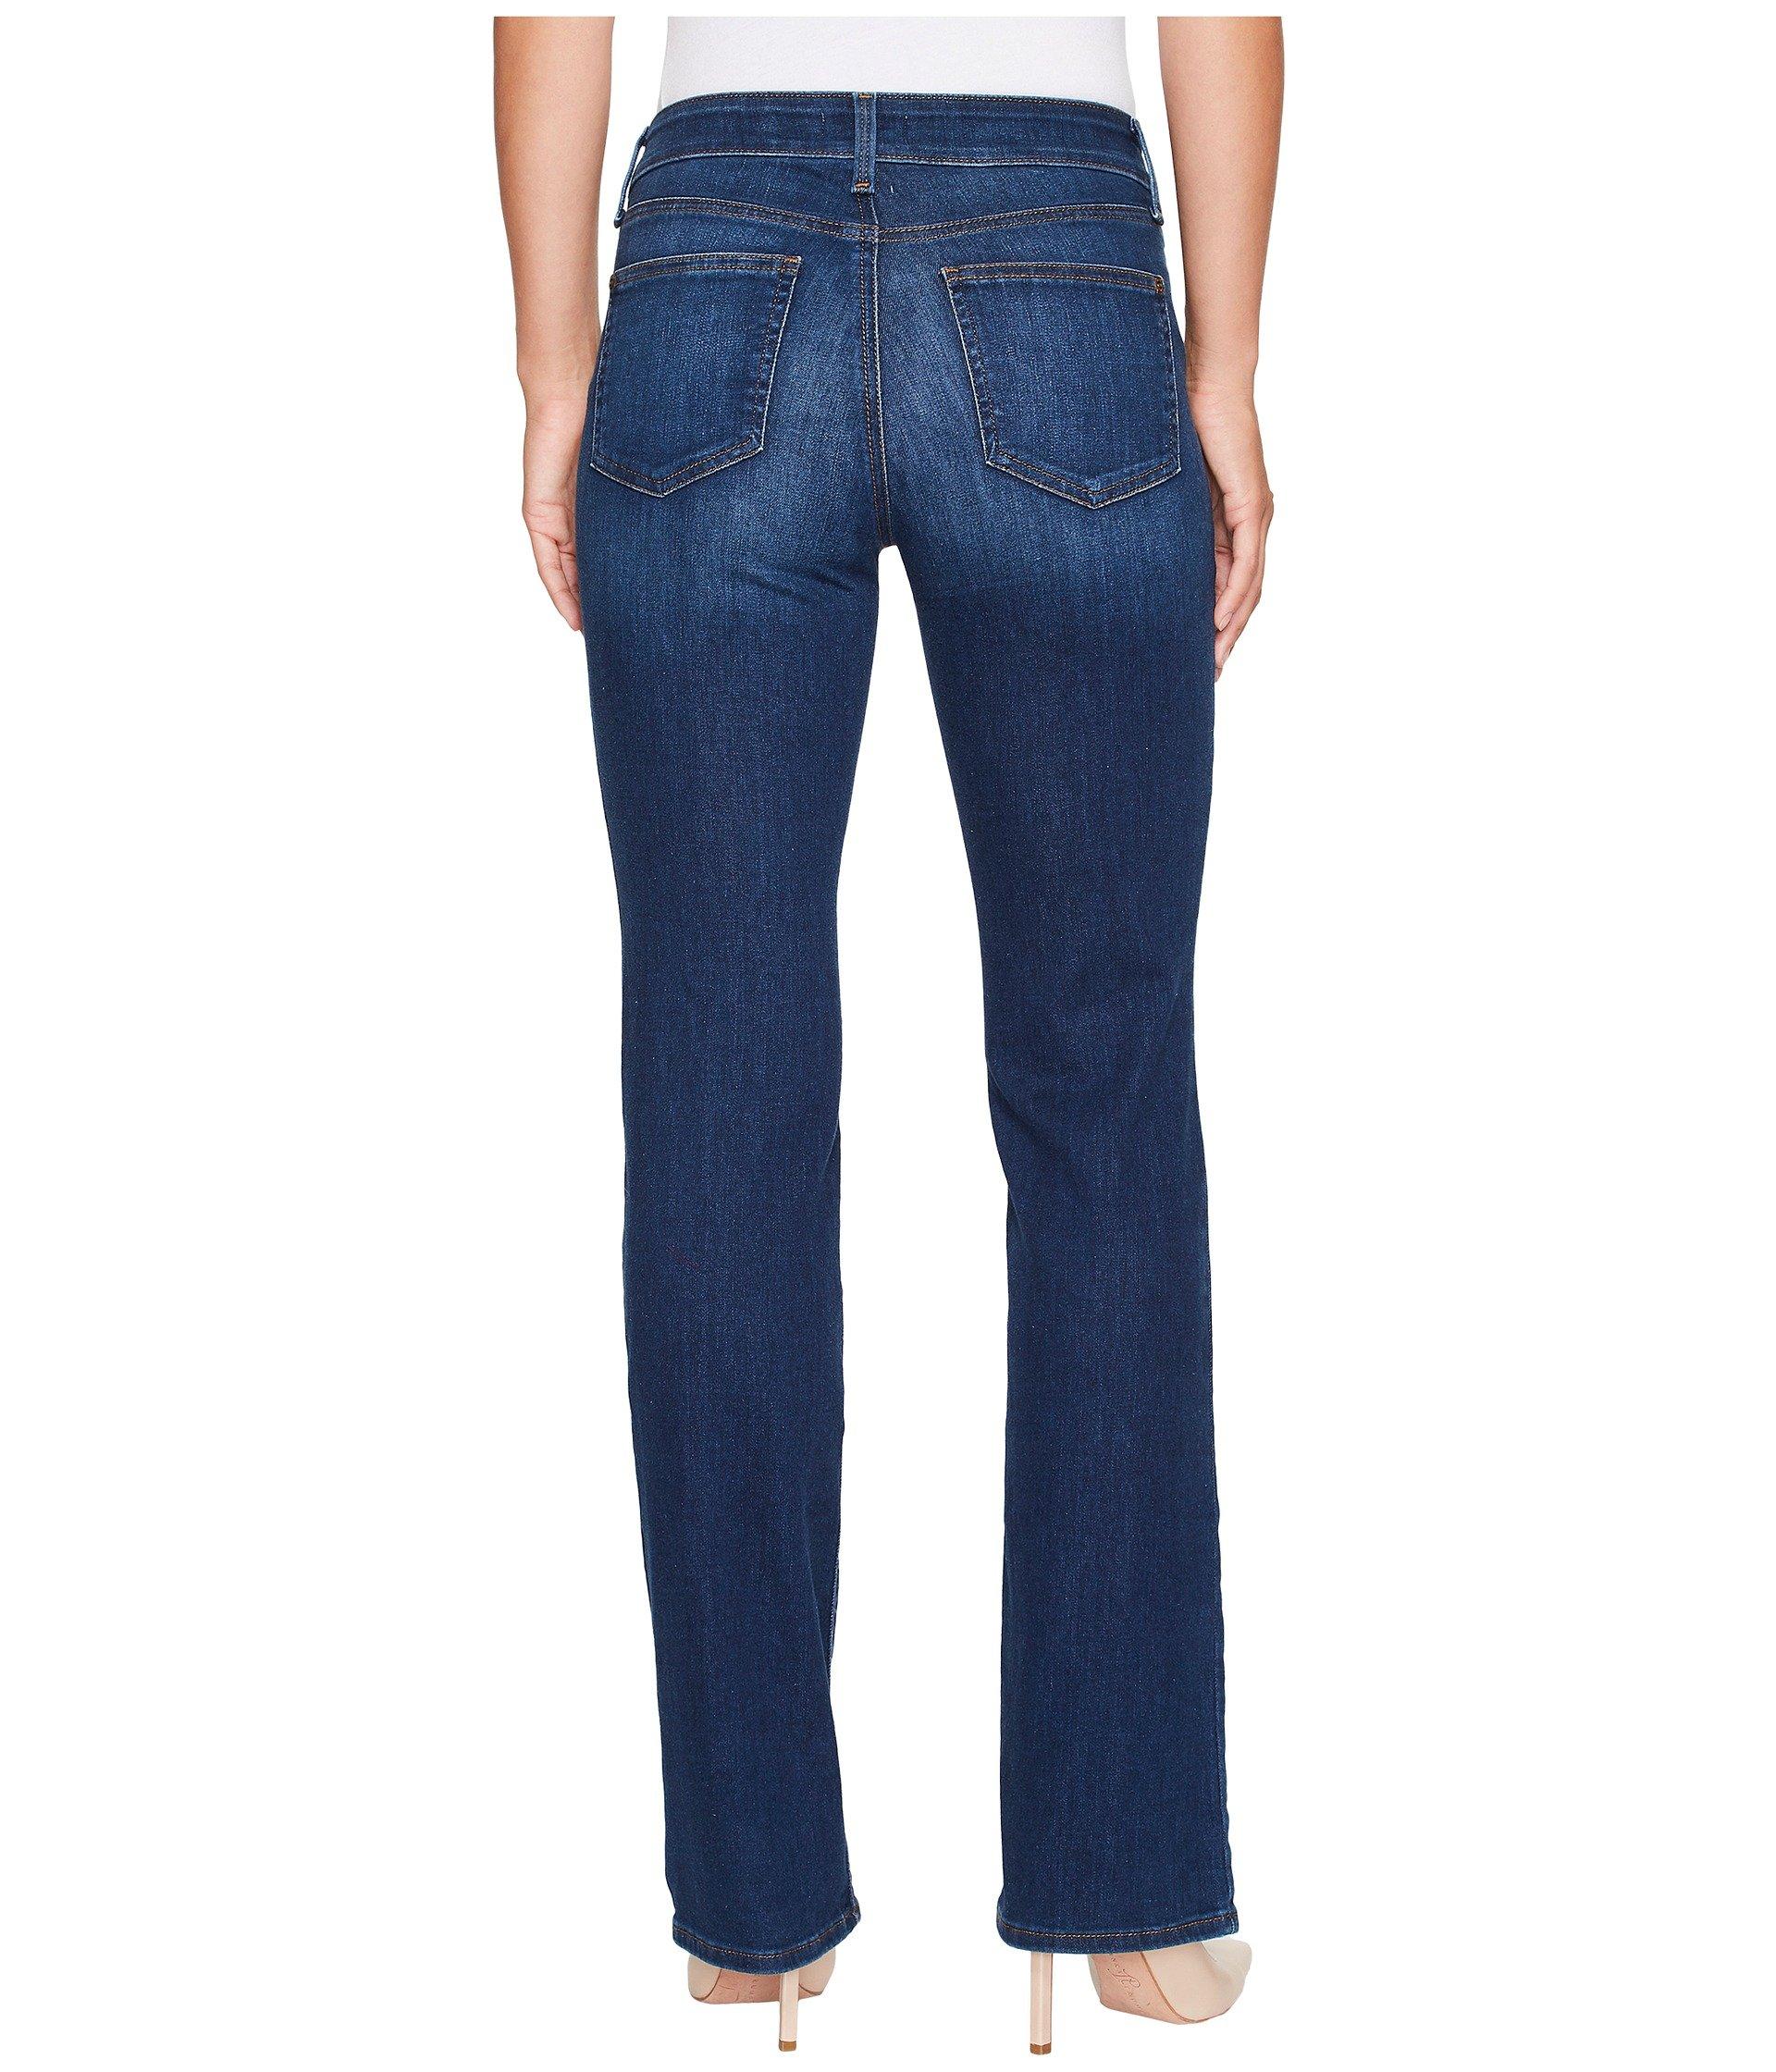 Nydj 'barbara' colored denim bootcut jeans